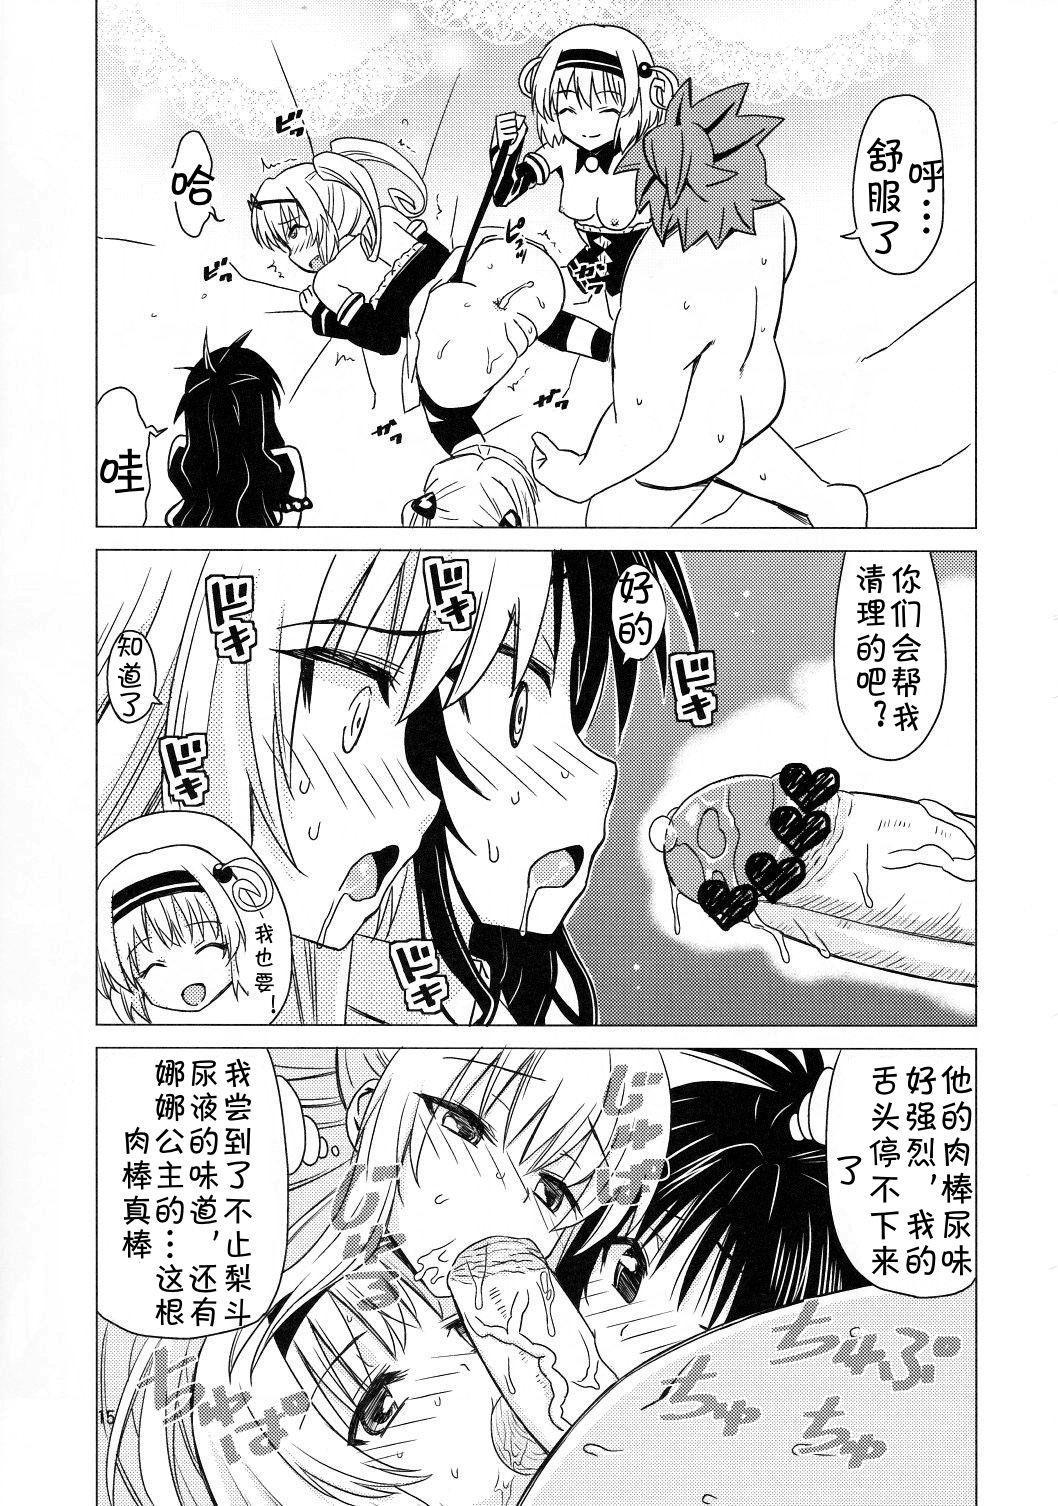 Kanryou Harem Keikaku Imouto Tengoku | Harem Plan Complete - Little Sister Heaven 13